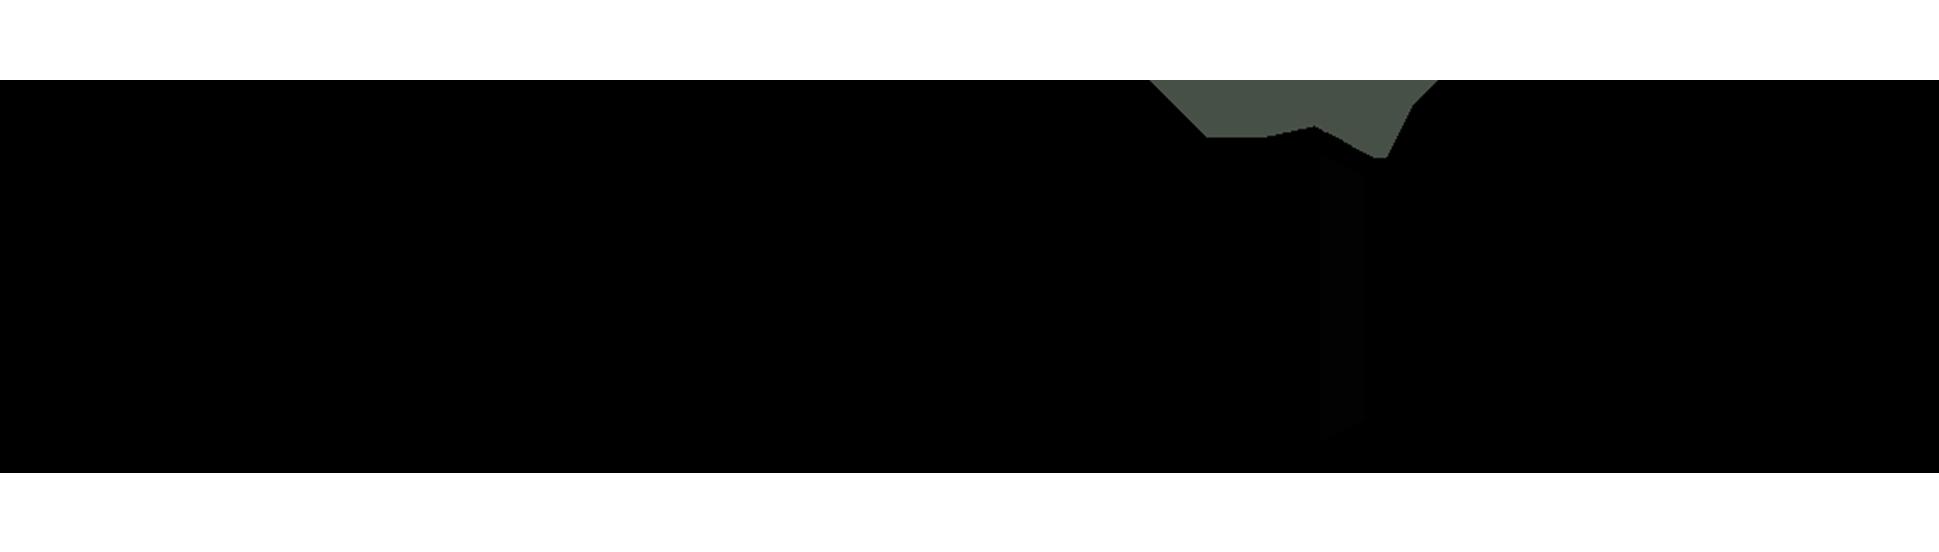 neoltih web